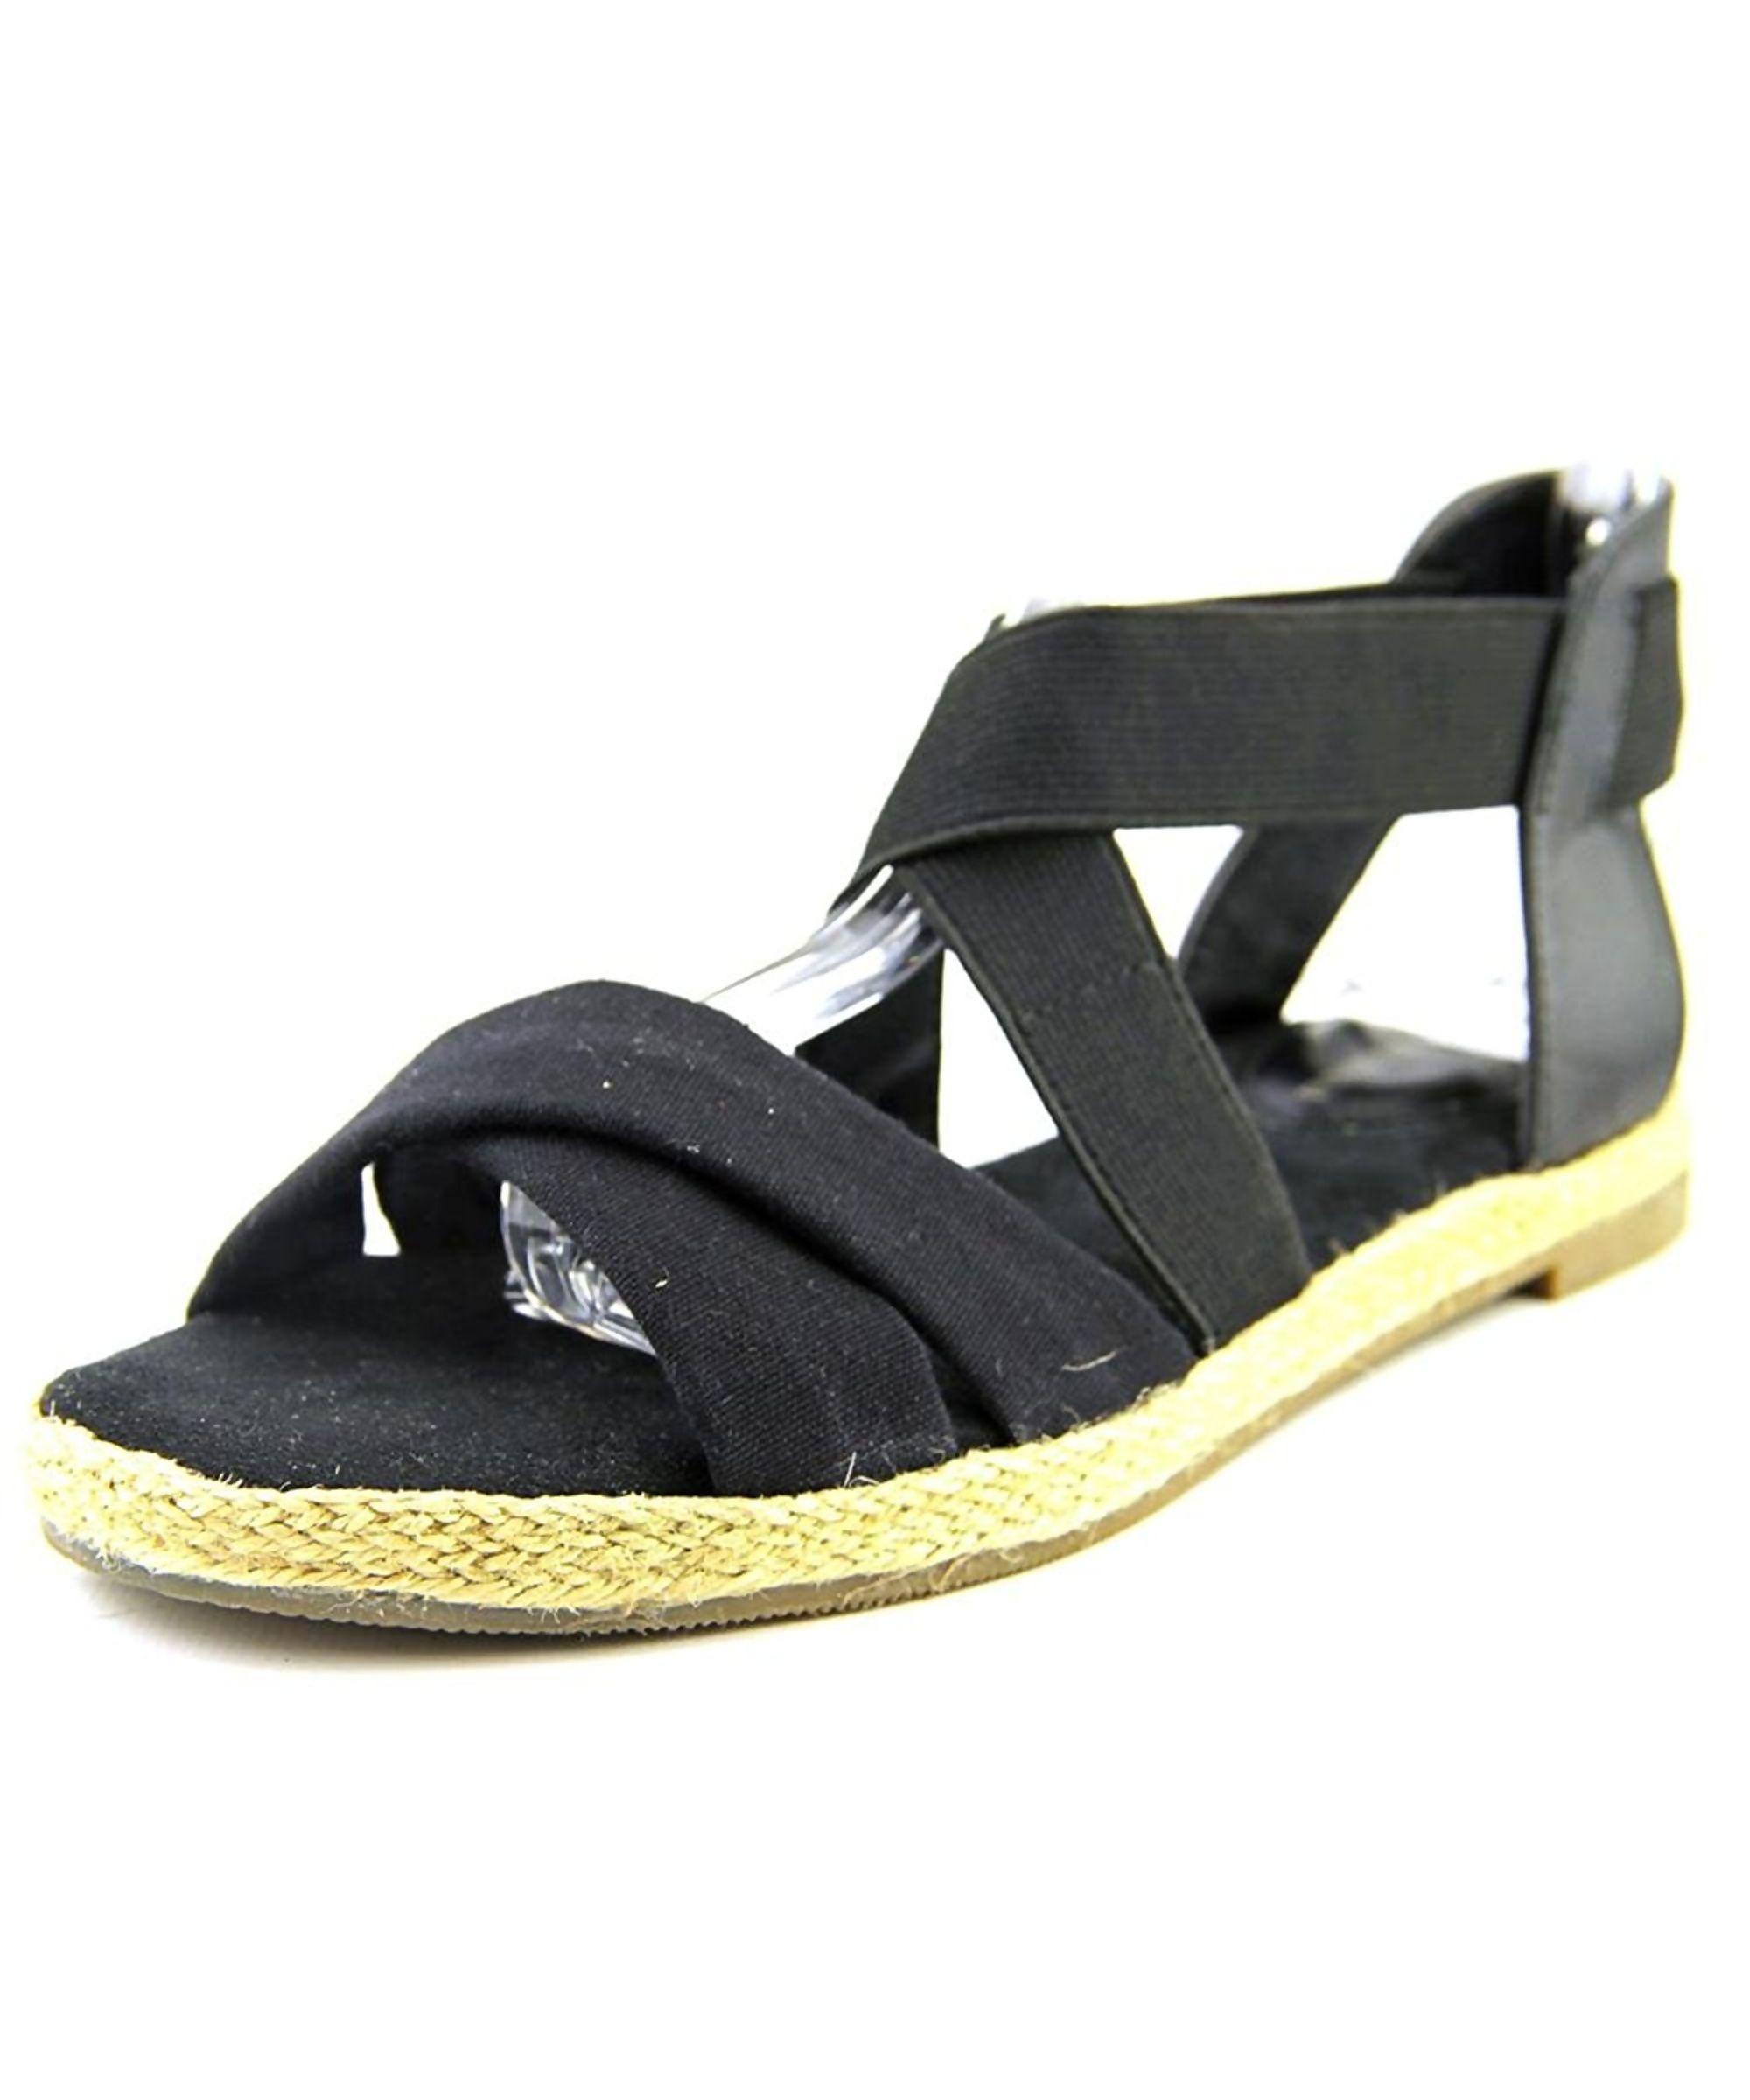 mats size s womens shoes c sanuk women flip yoga nordstrom mat flop